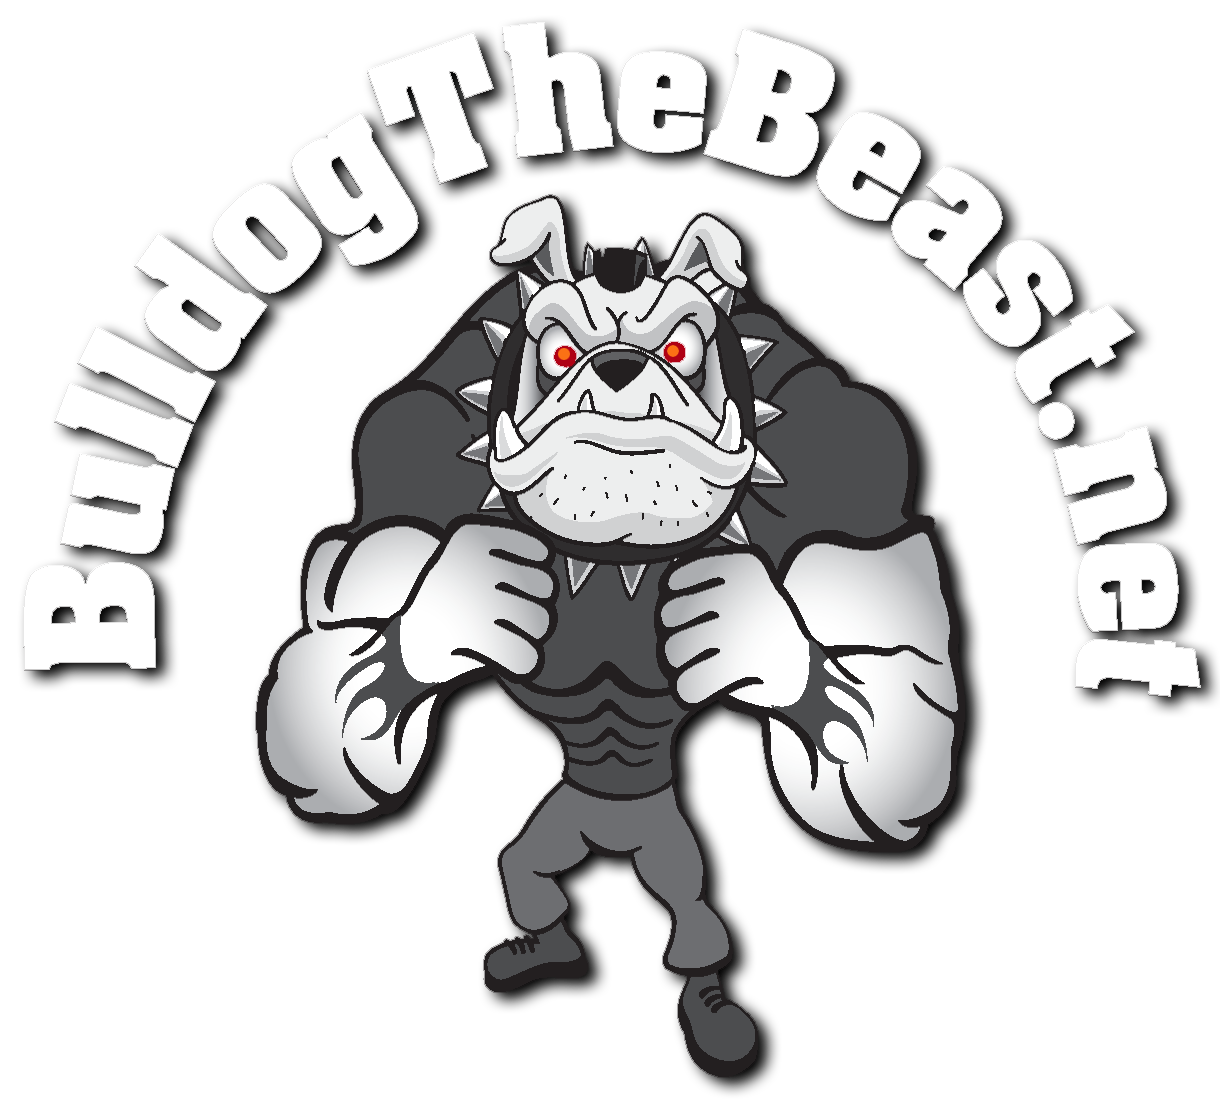 Beast clipart bulldog The Bulldog the Plymouth in